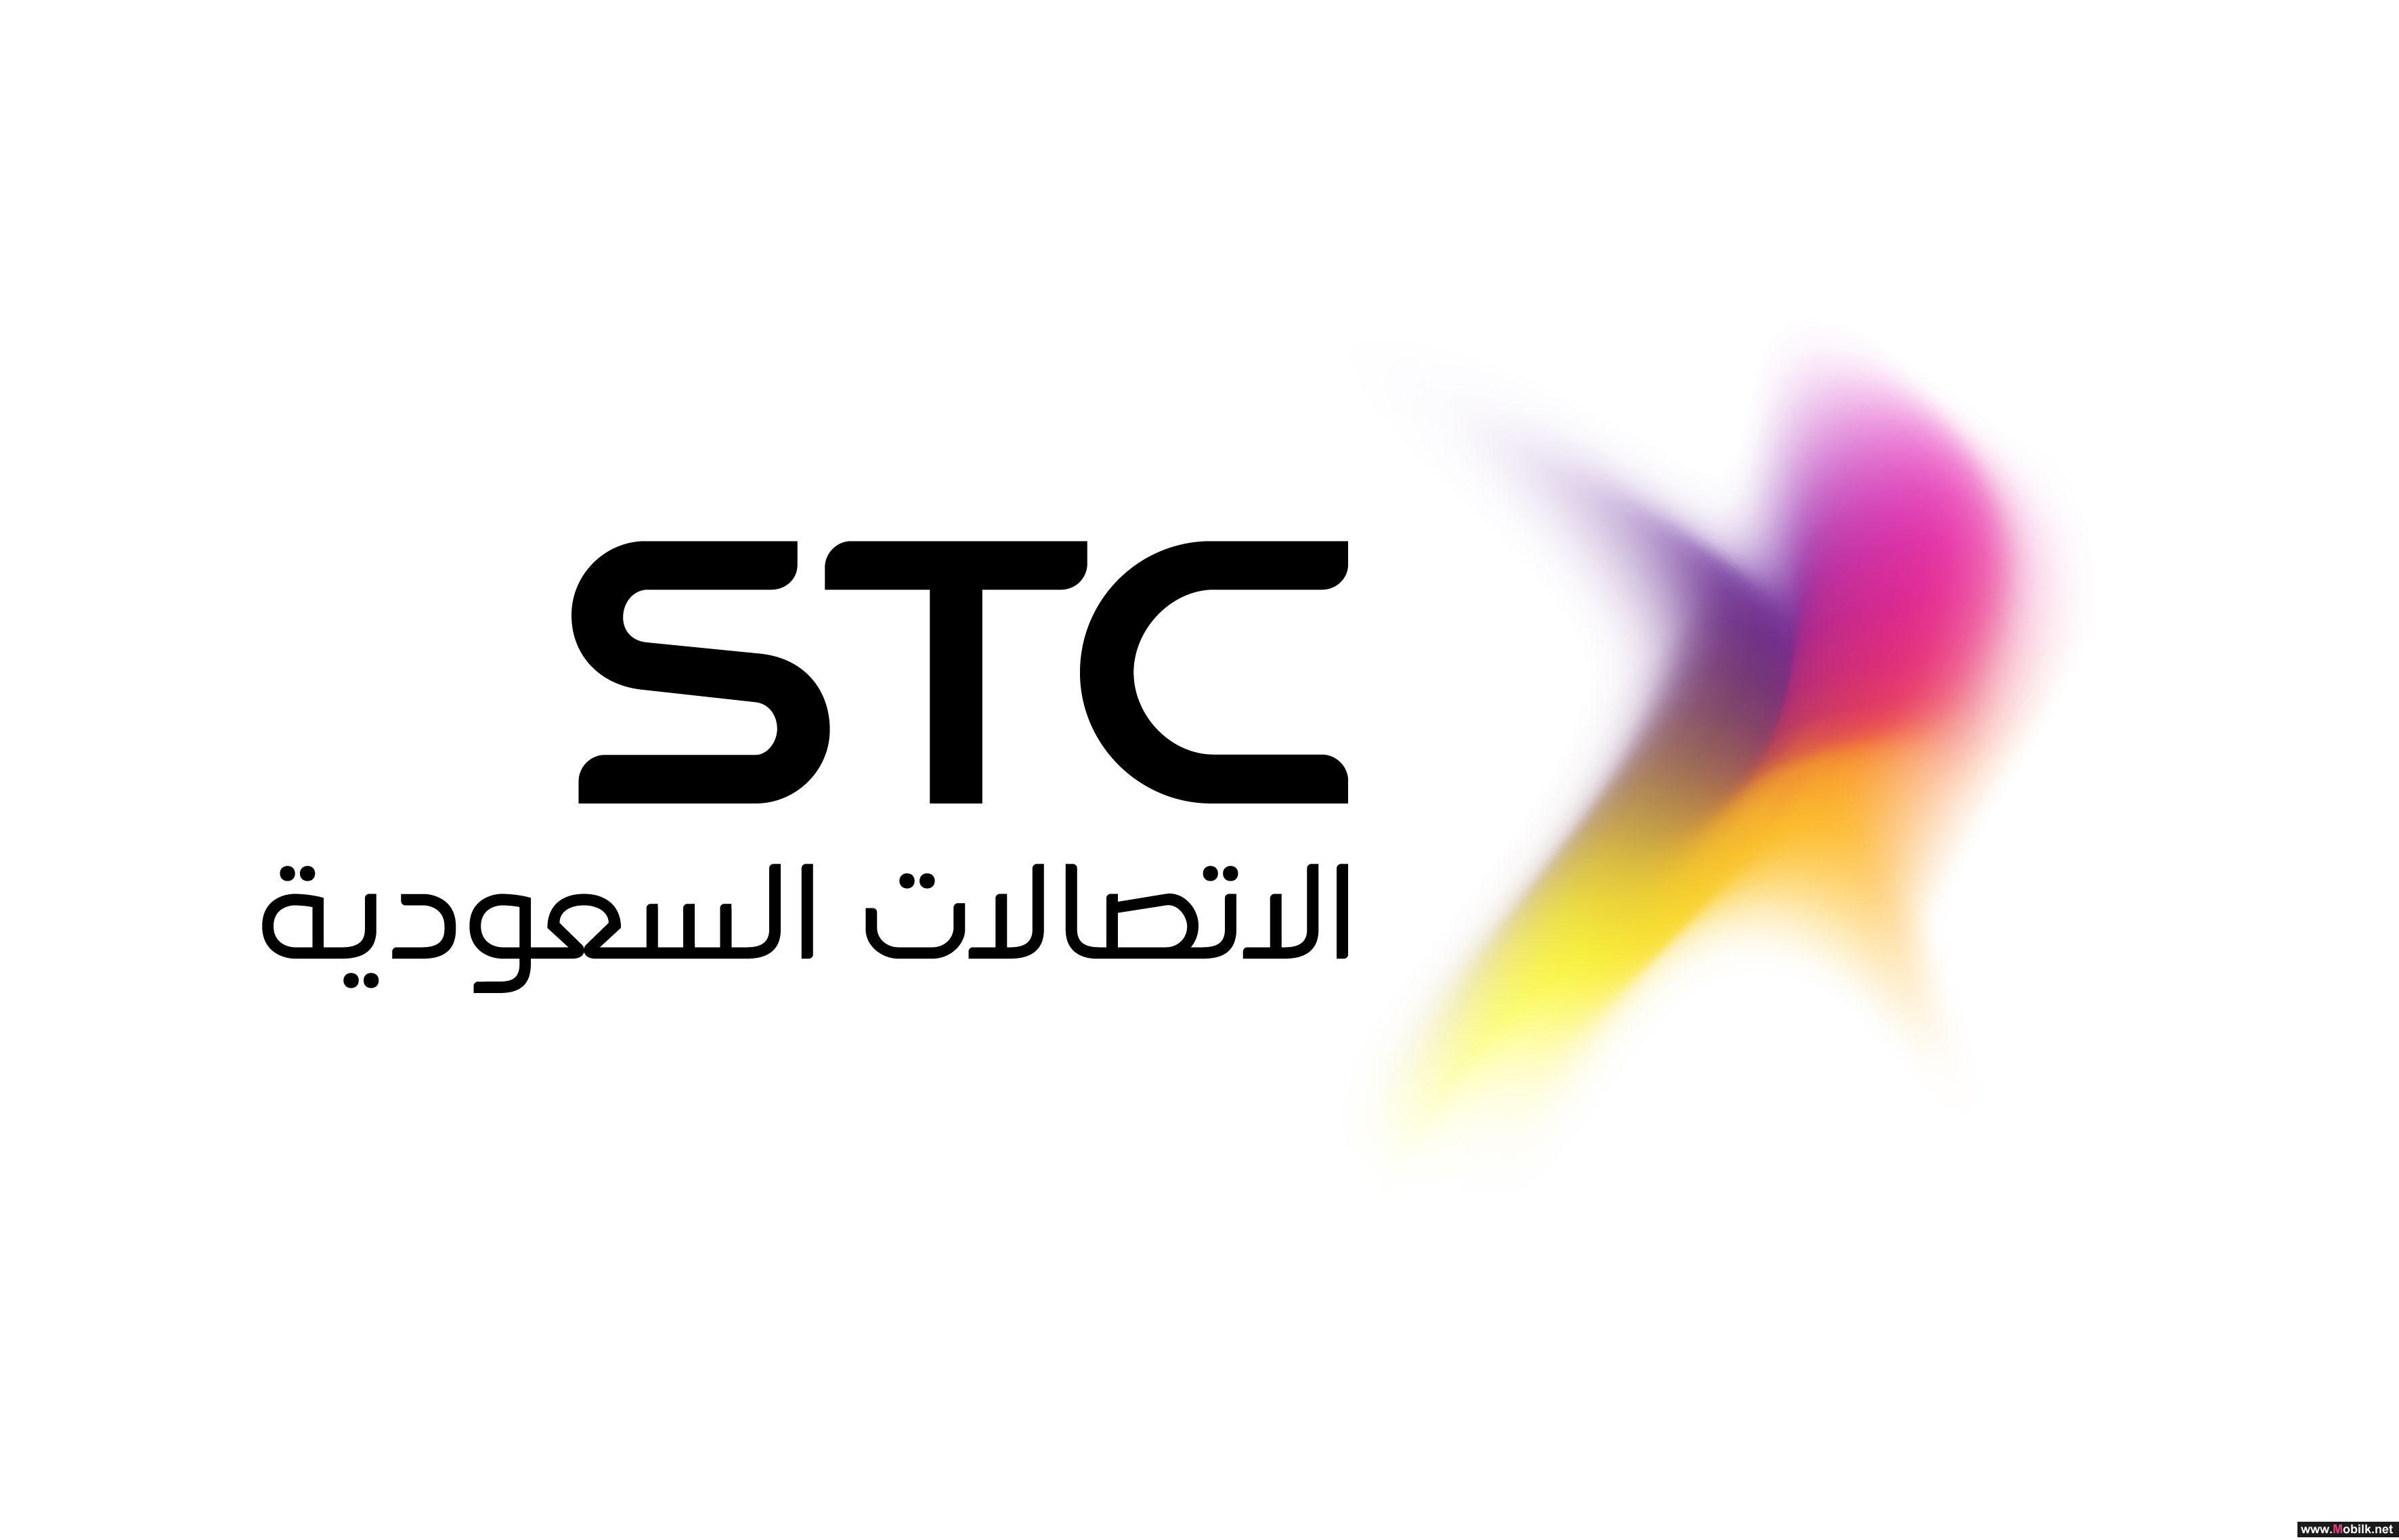 STC تكشف عن باقات جديدة تتيح التحكّم في الفاتورة الشهريّة